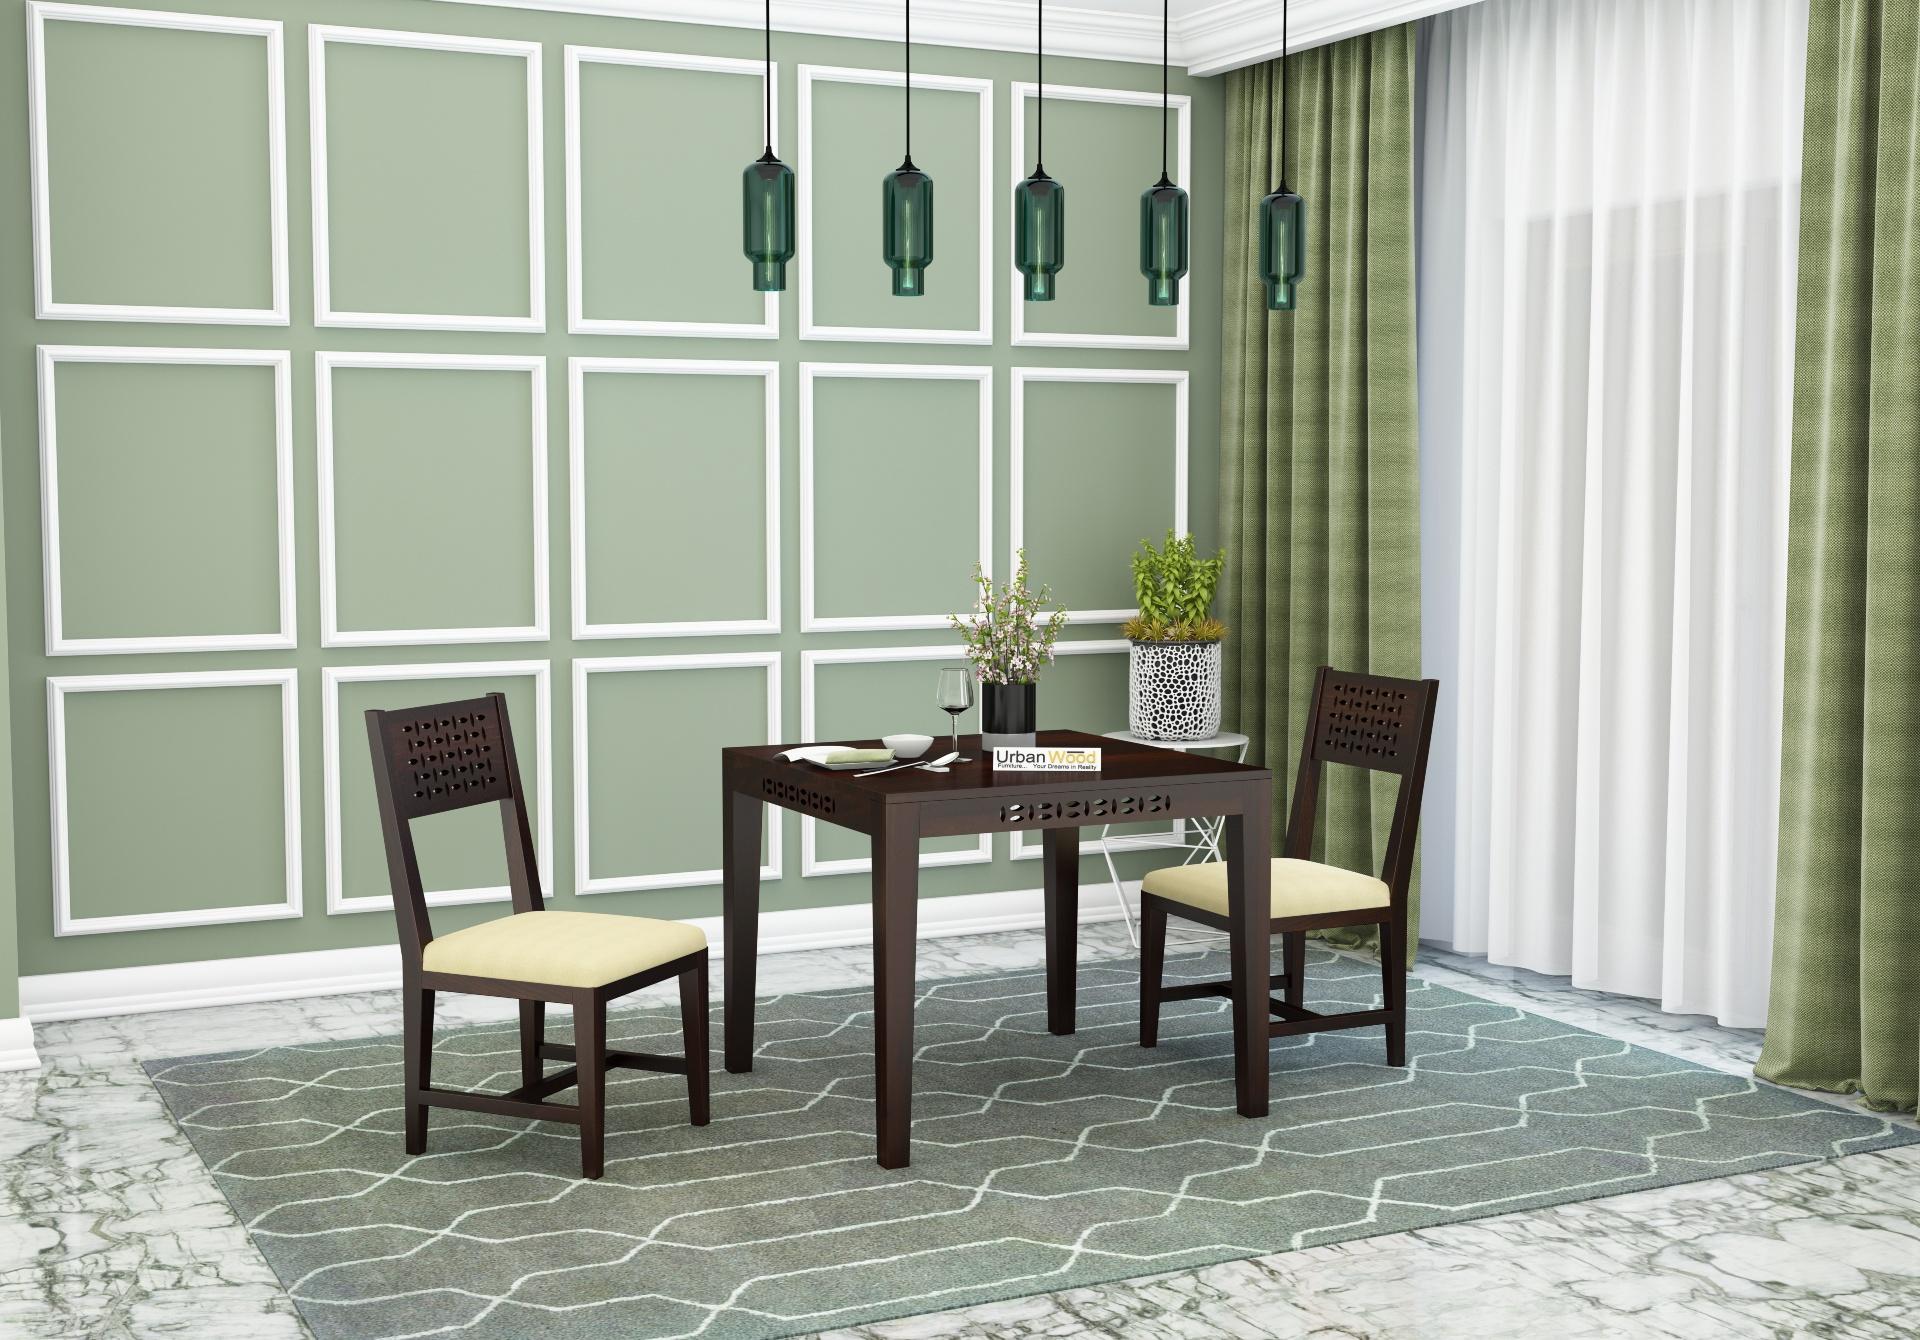 Woodora 2 Seater Dining Set with Cushion <small>(Walnut Finish)</small>